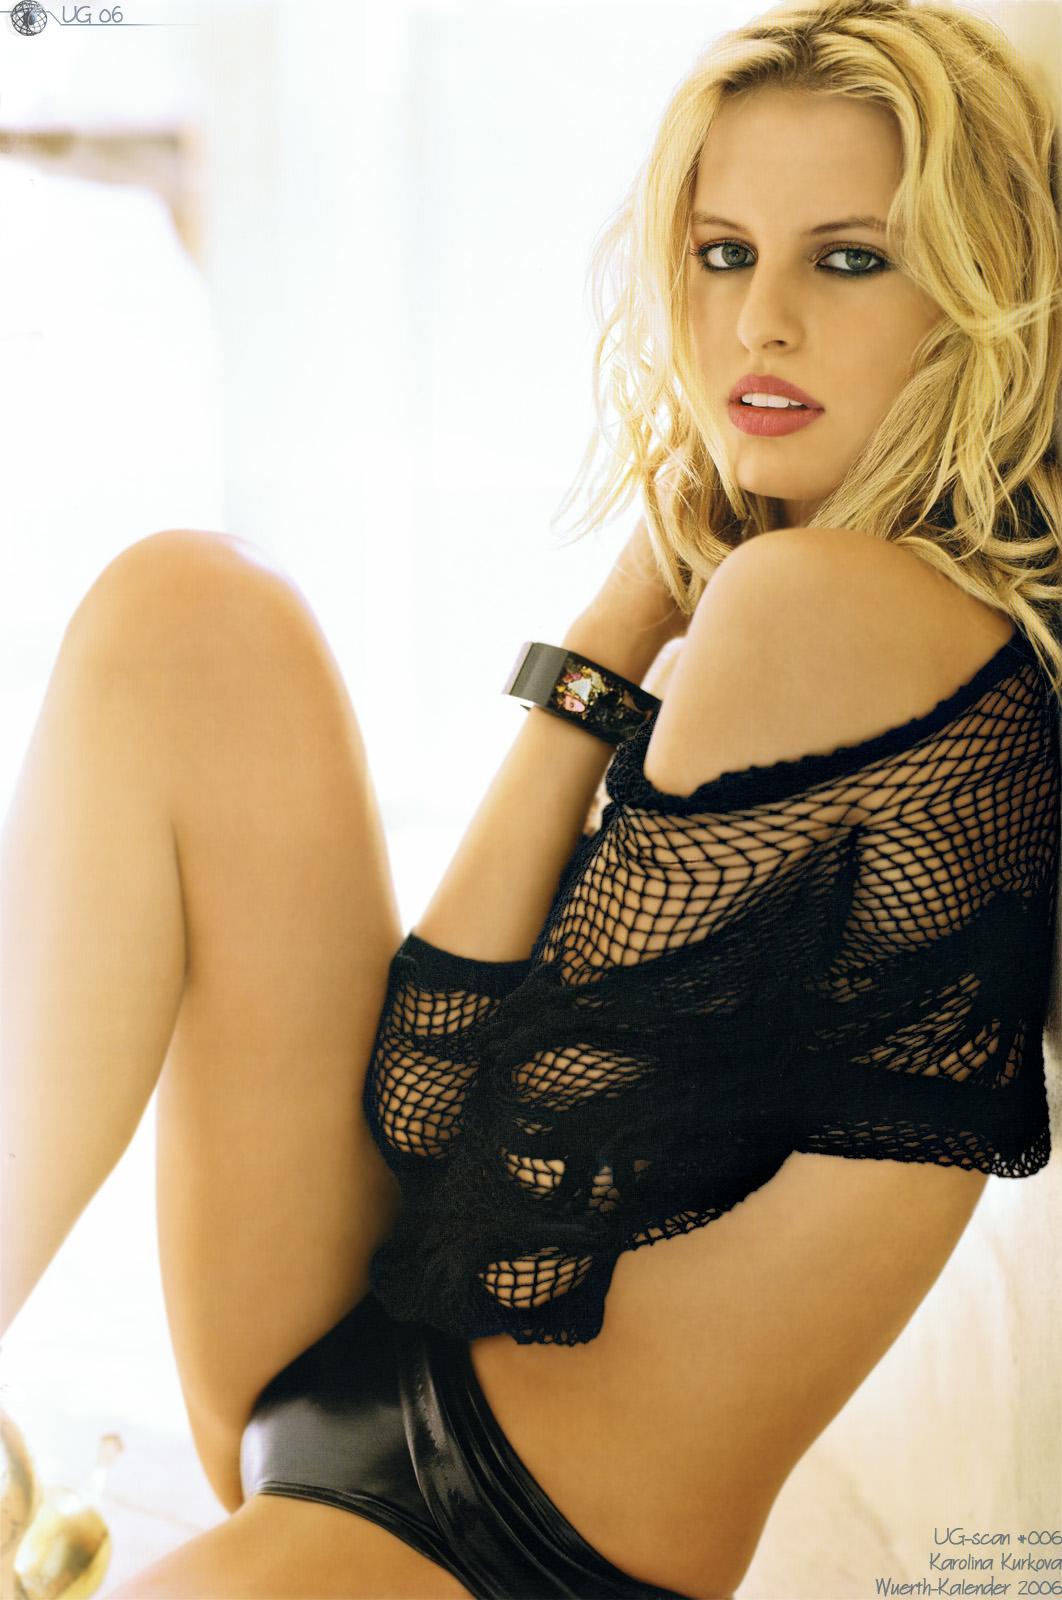 Danita Angell in lingerie